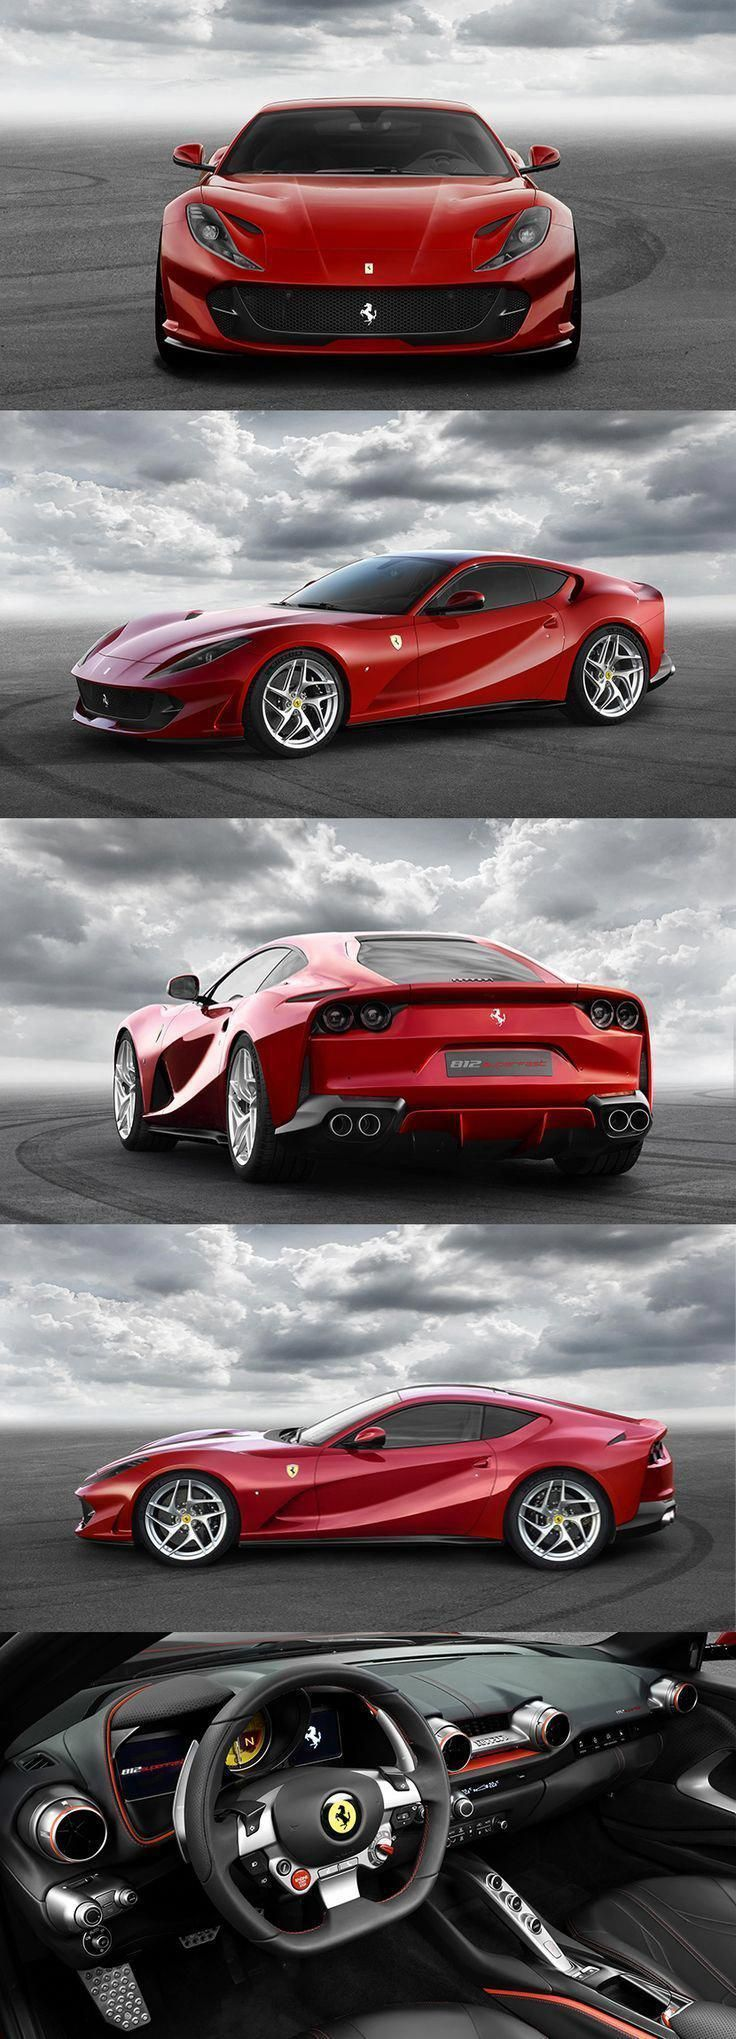 Ferrari 812 Superfast 800 Hp Ferrari Superfast Luxurycars Coolcars Ferrariclassiccars Cars Super Cars Ferrari